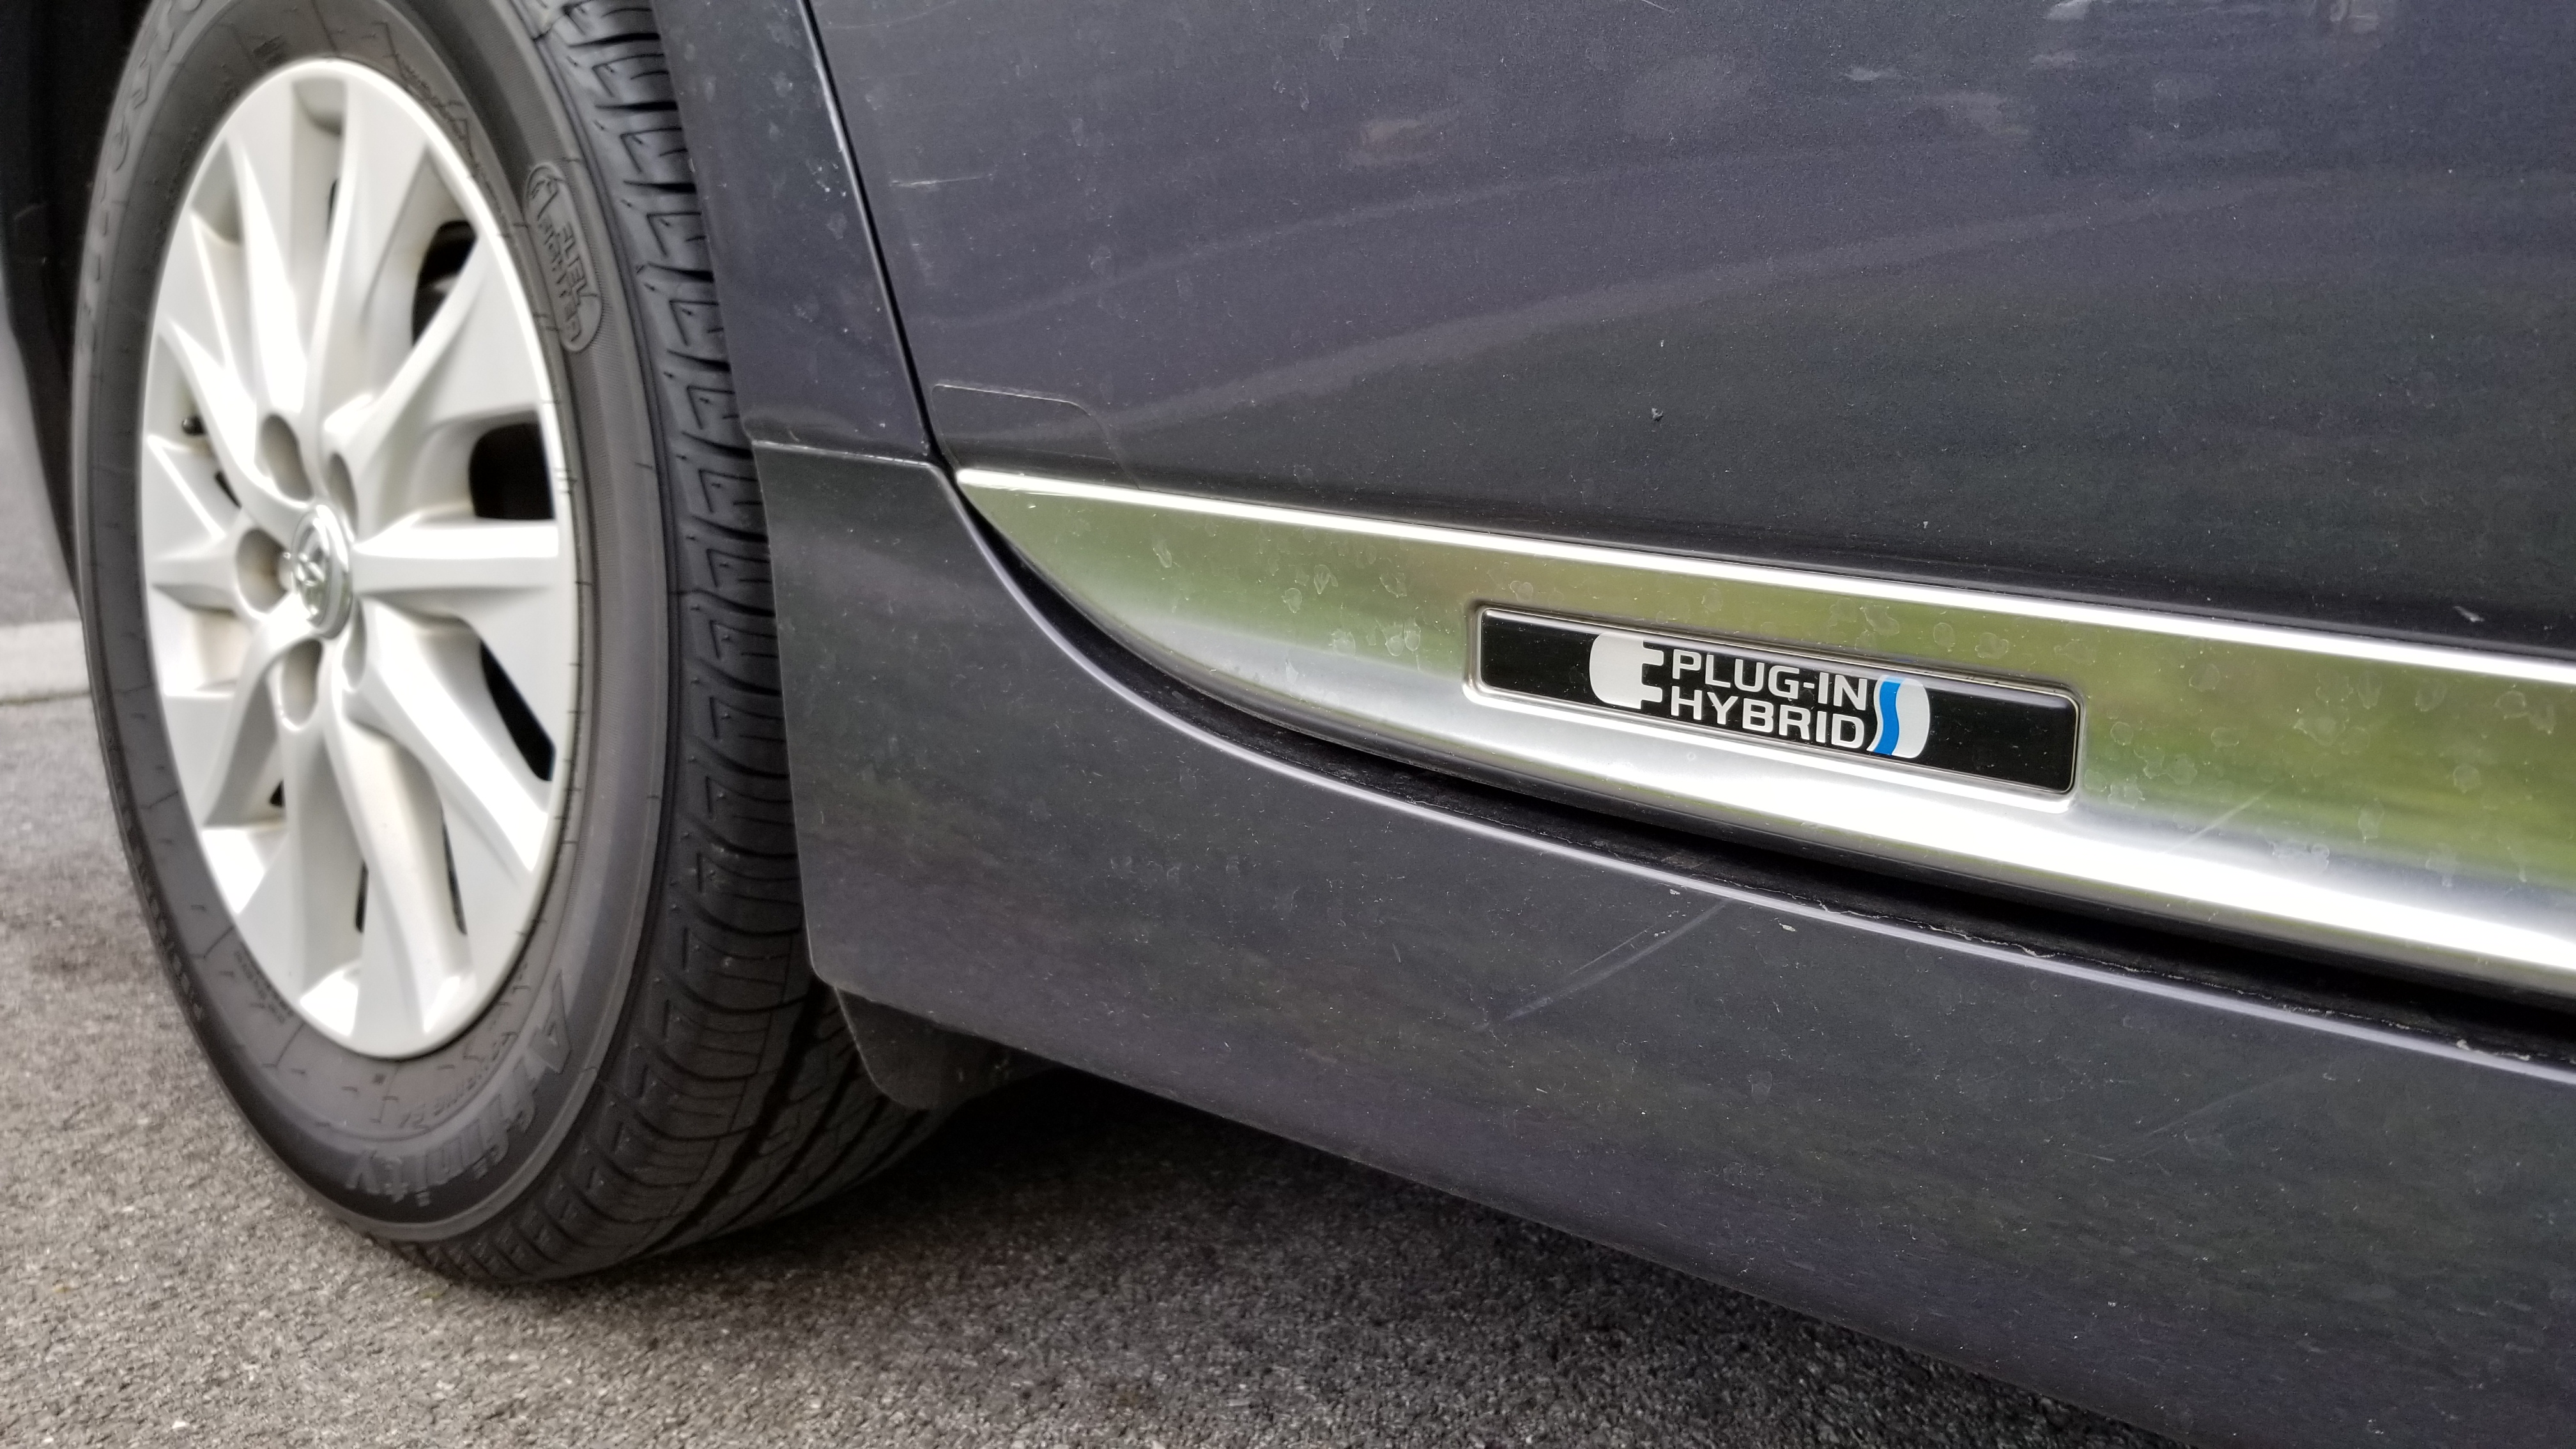 plug-in badges everywhere